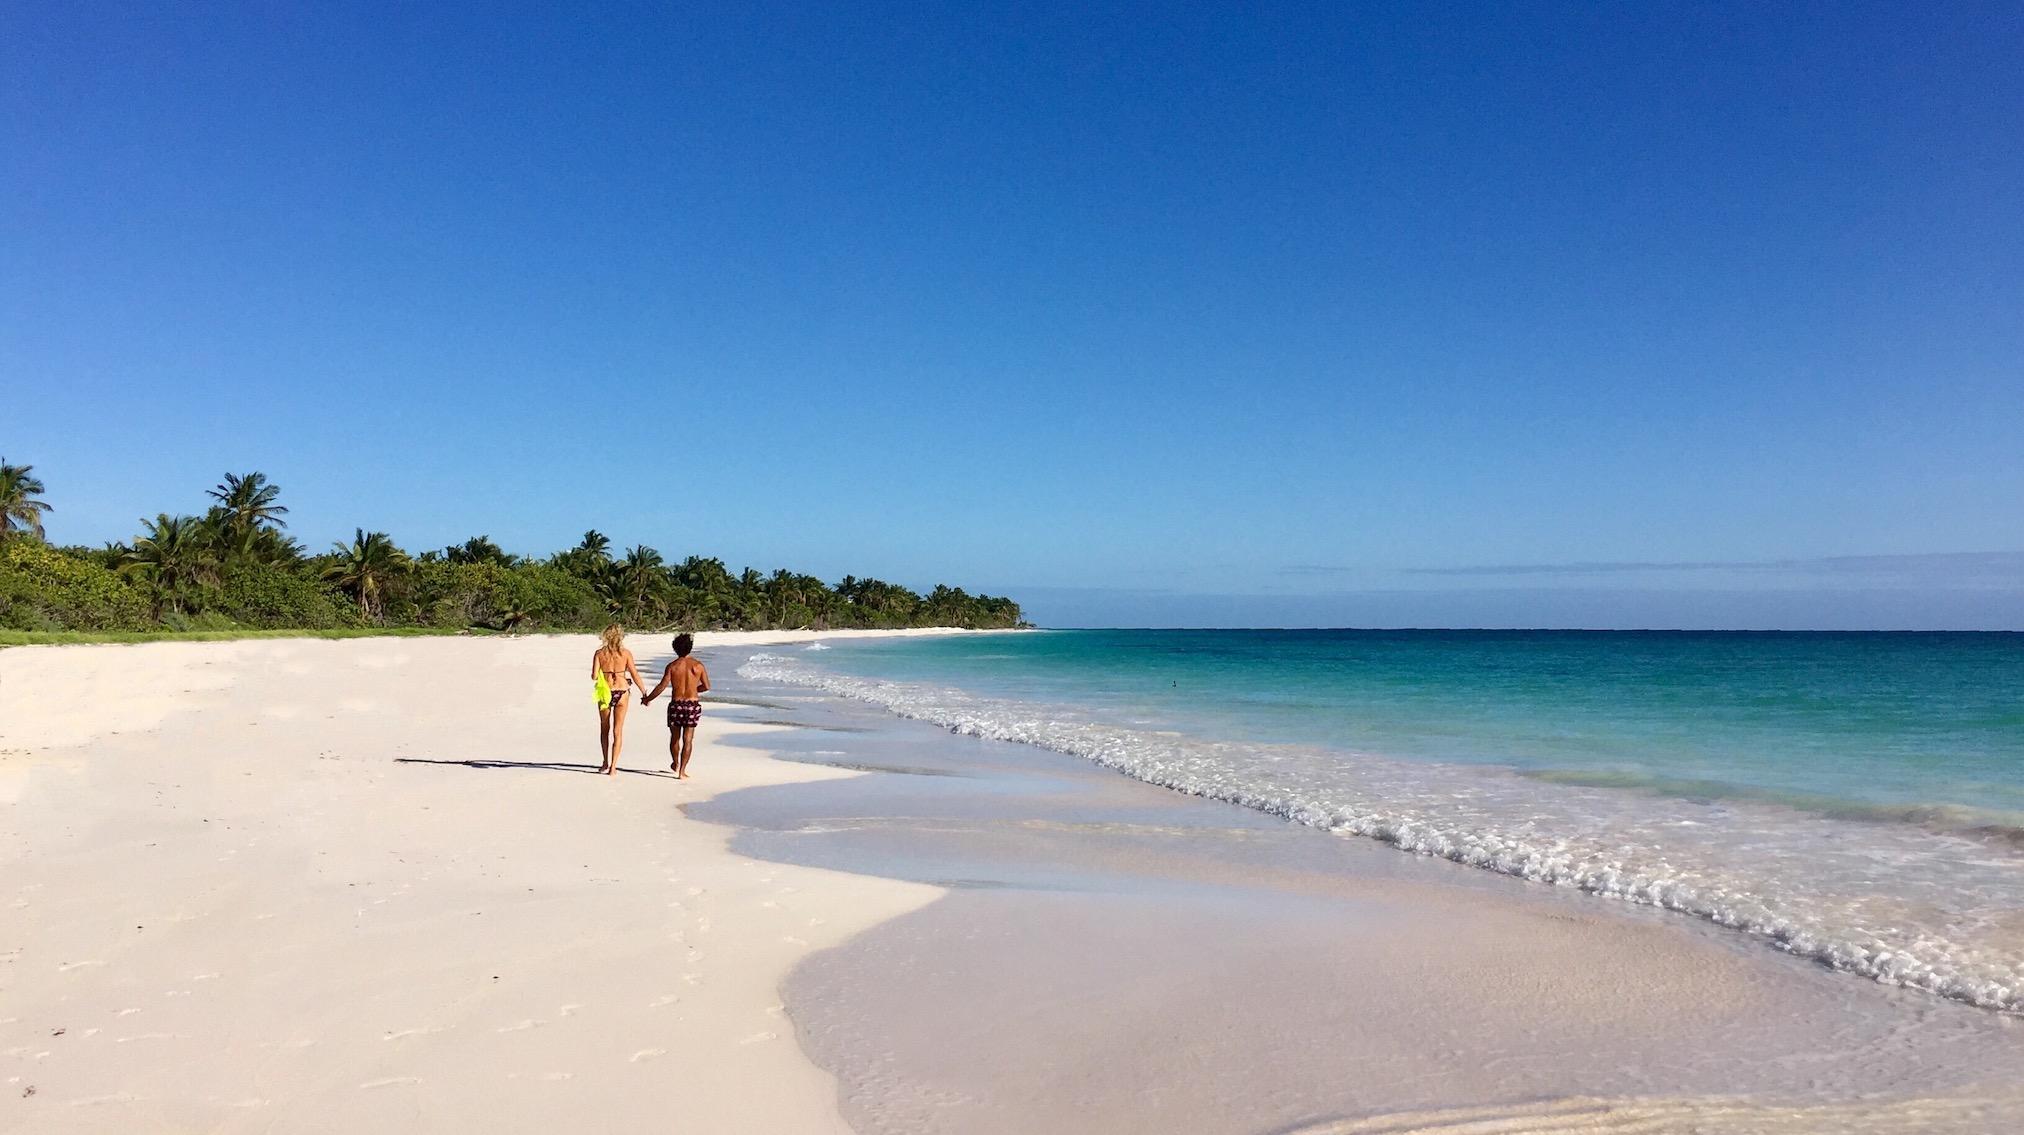 Na'iik long beach - web size.jpg